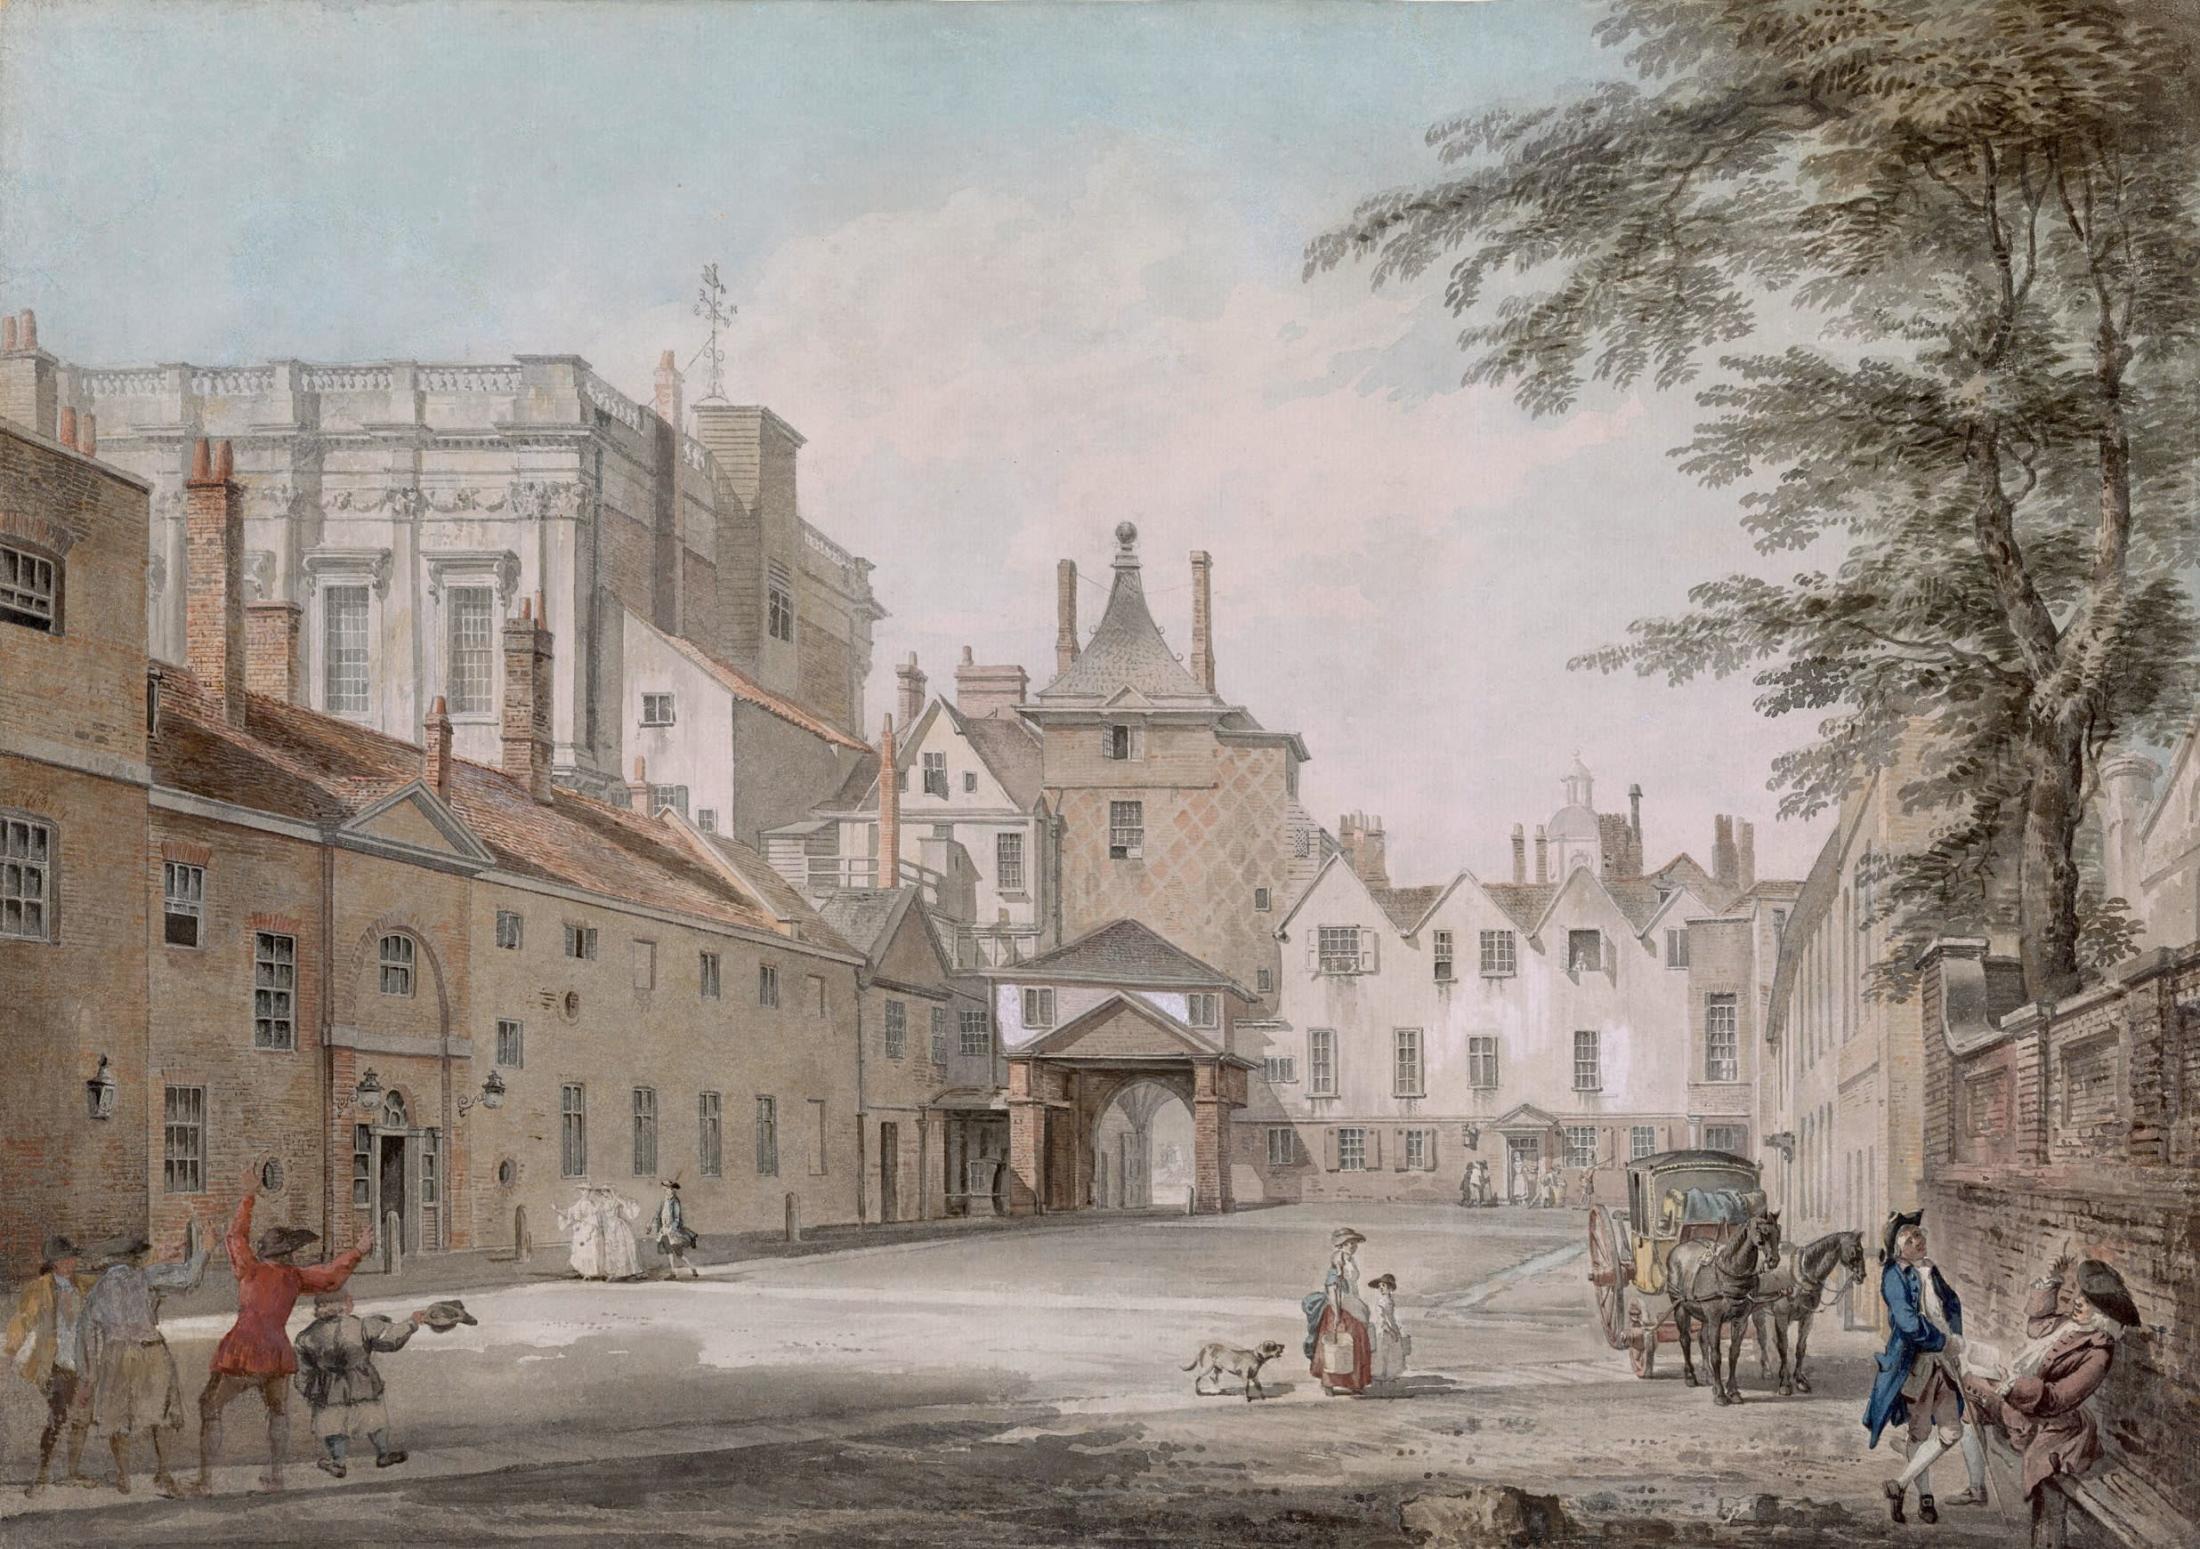 Banqueting Hall, Whitehall and Scotland Yard